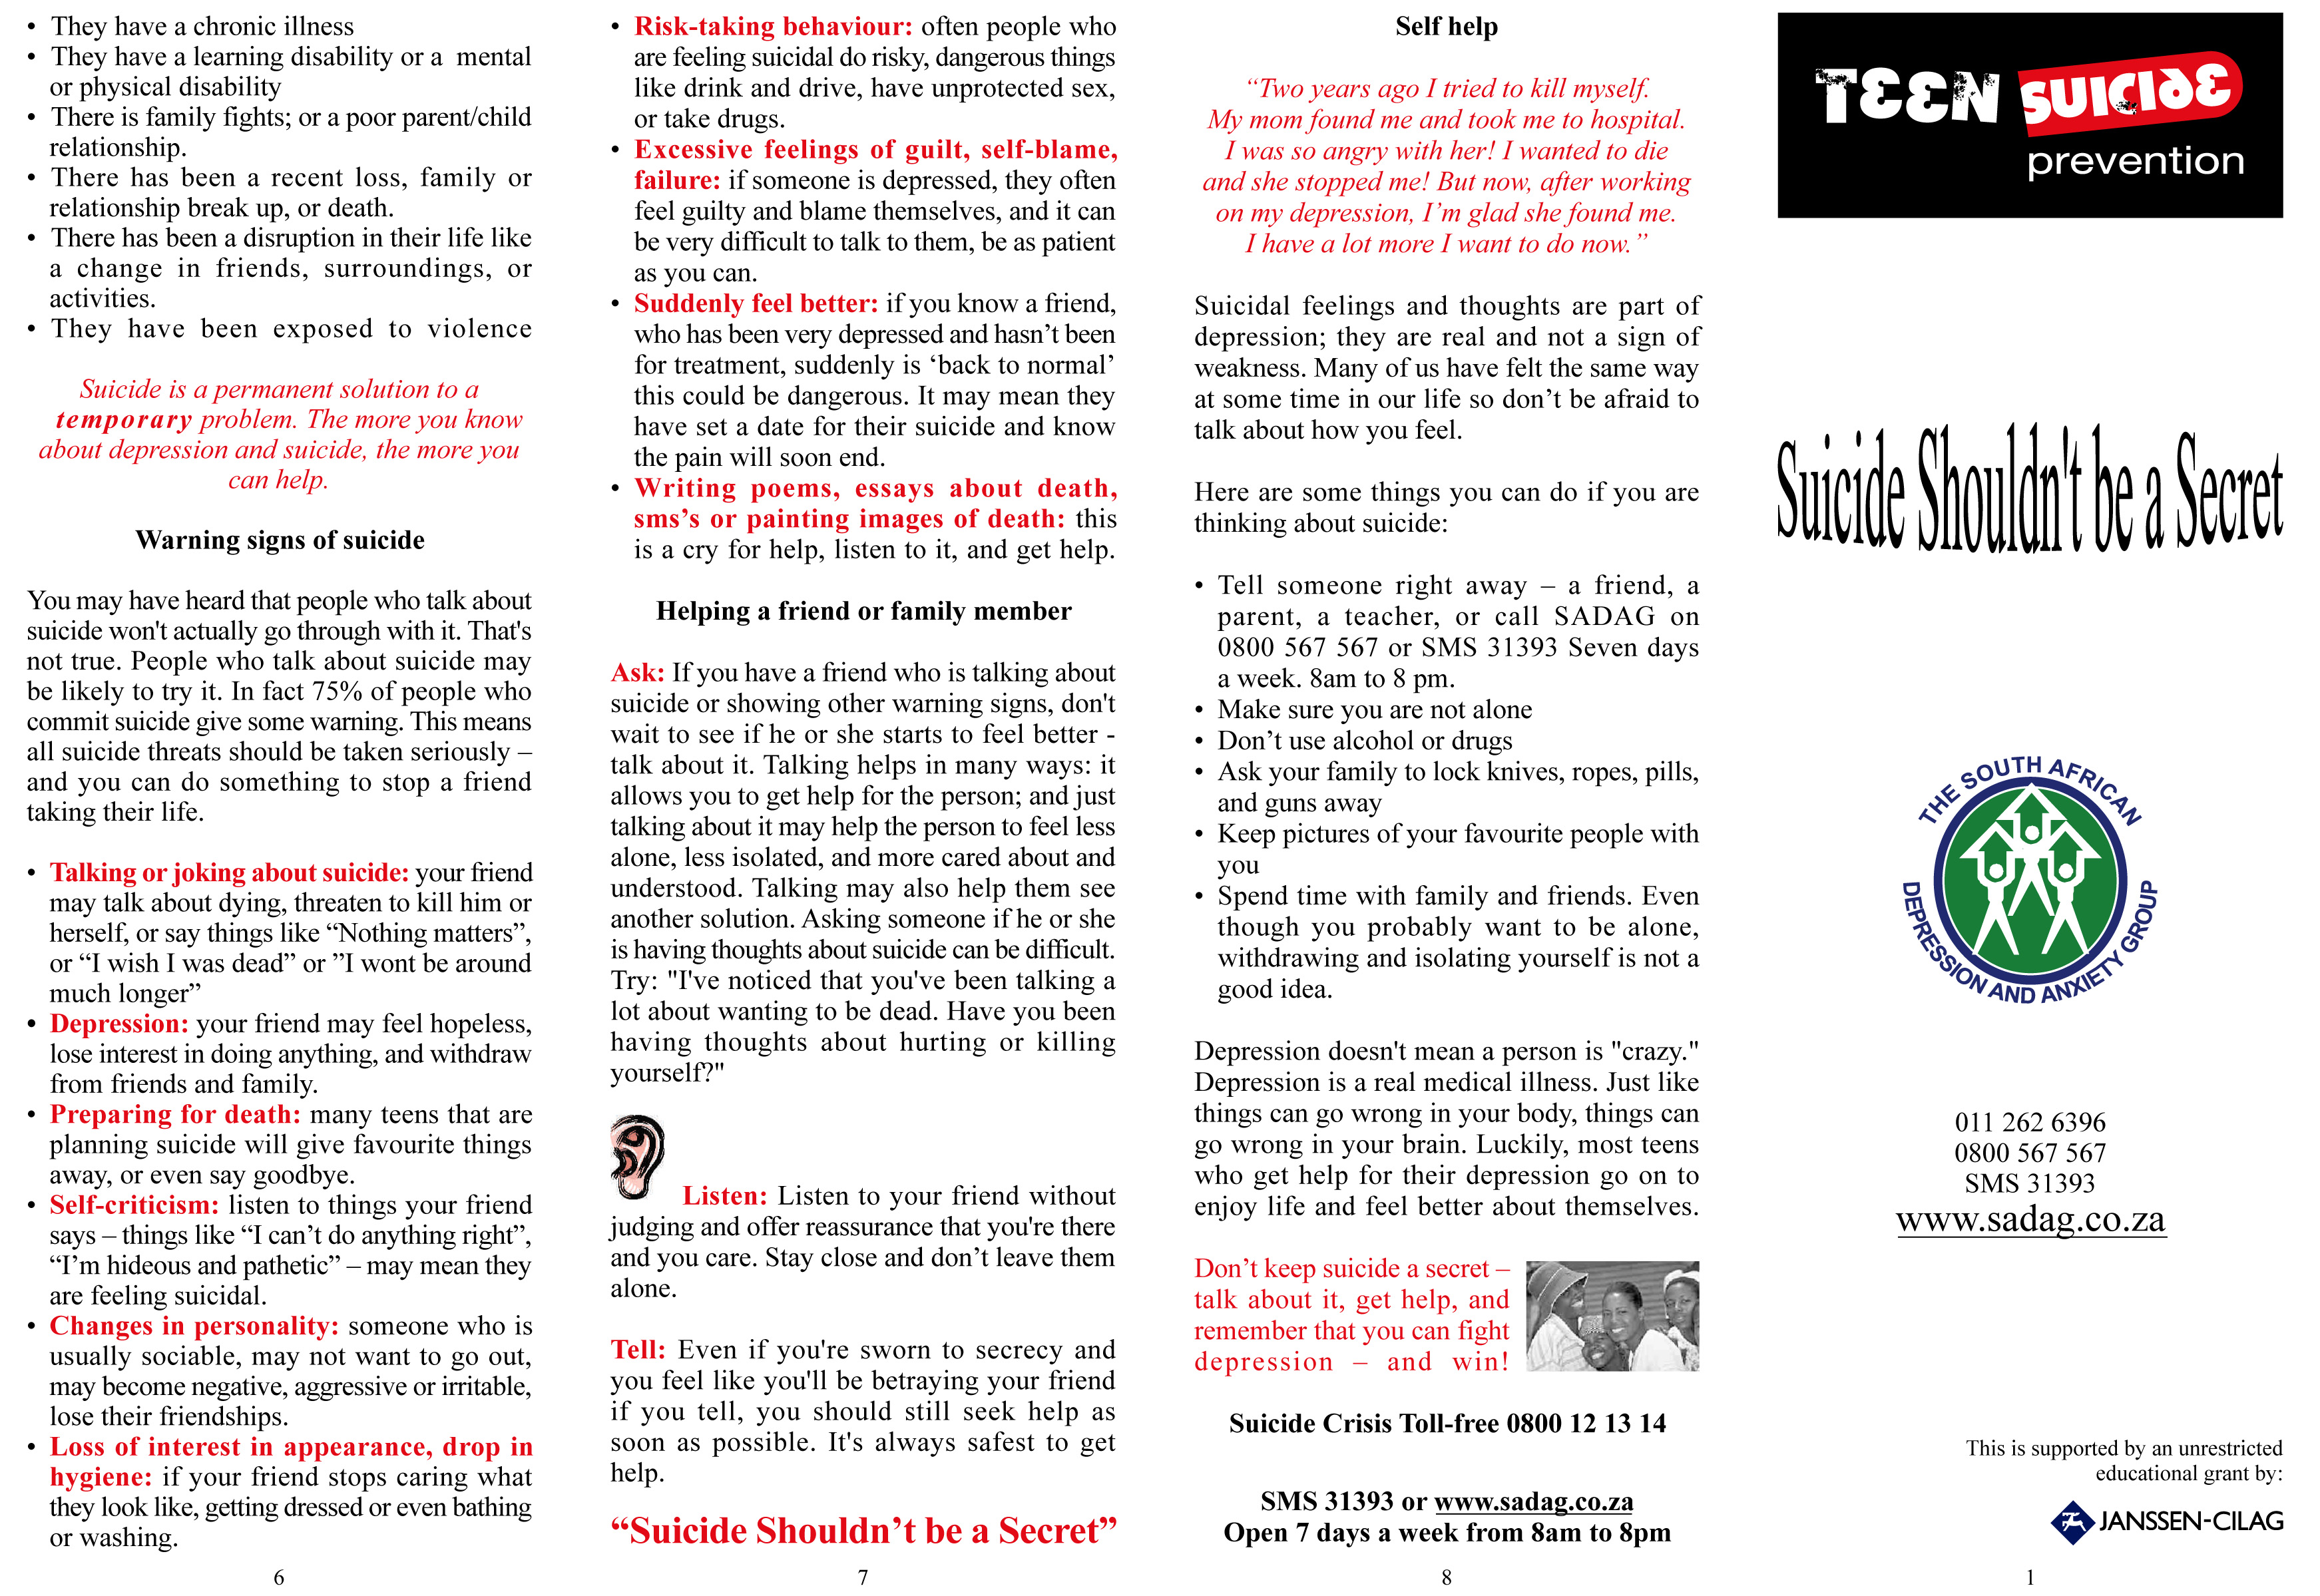 SHANICE34sad -Teen  suicide brochure from SADAG